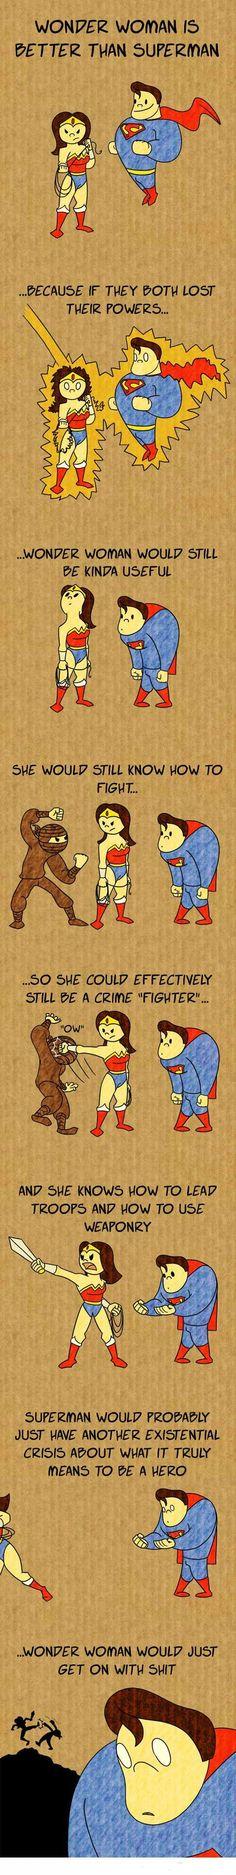 Why Wonder Woman > Superman